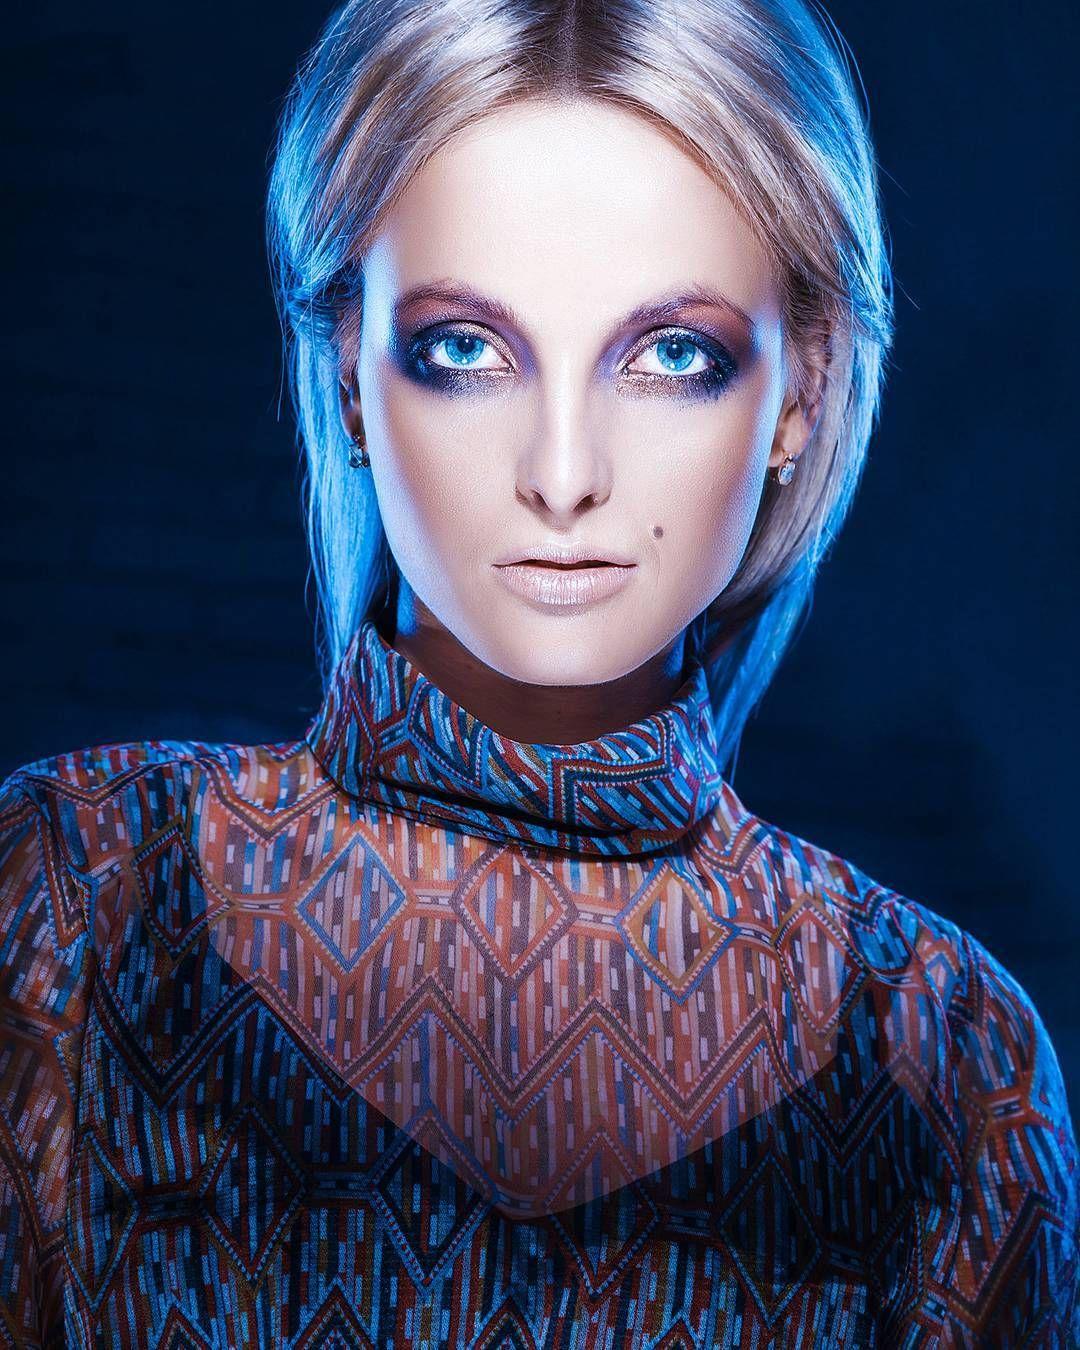 Moonlight. MUA Irina Pshenichnaya #moodyportrait #moonlight #fashion #editorial #followme #likeme #likemypic #bemyfollower #bestphoto #photooftheday #фотографыукраины